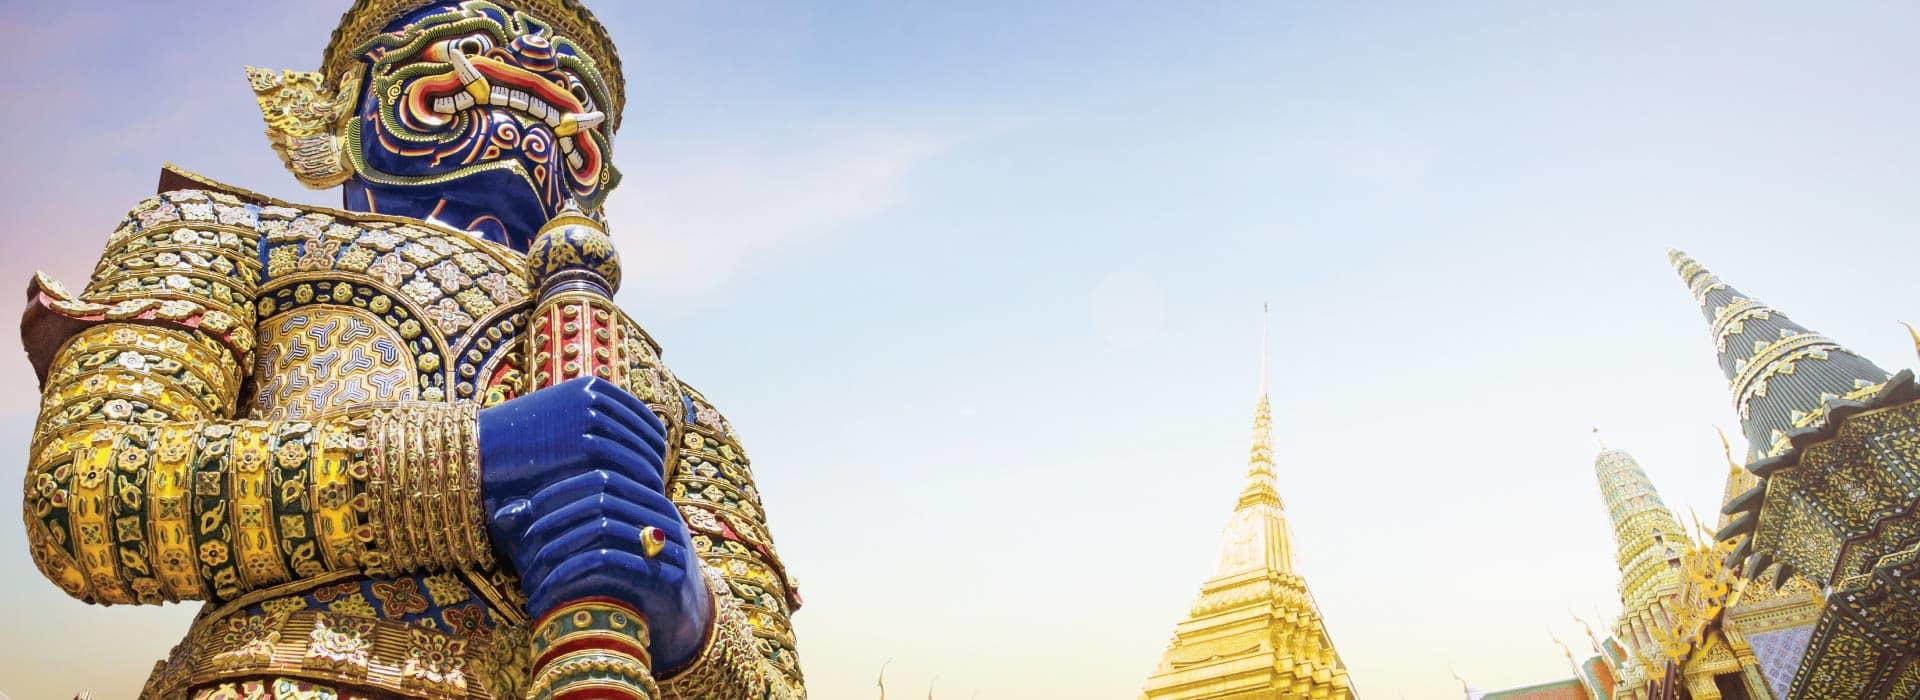 A statute in a temple in Bangkok Thailand